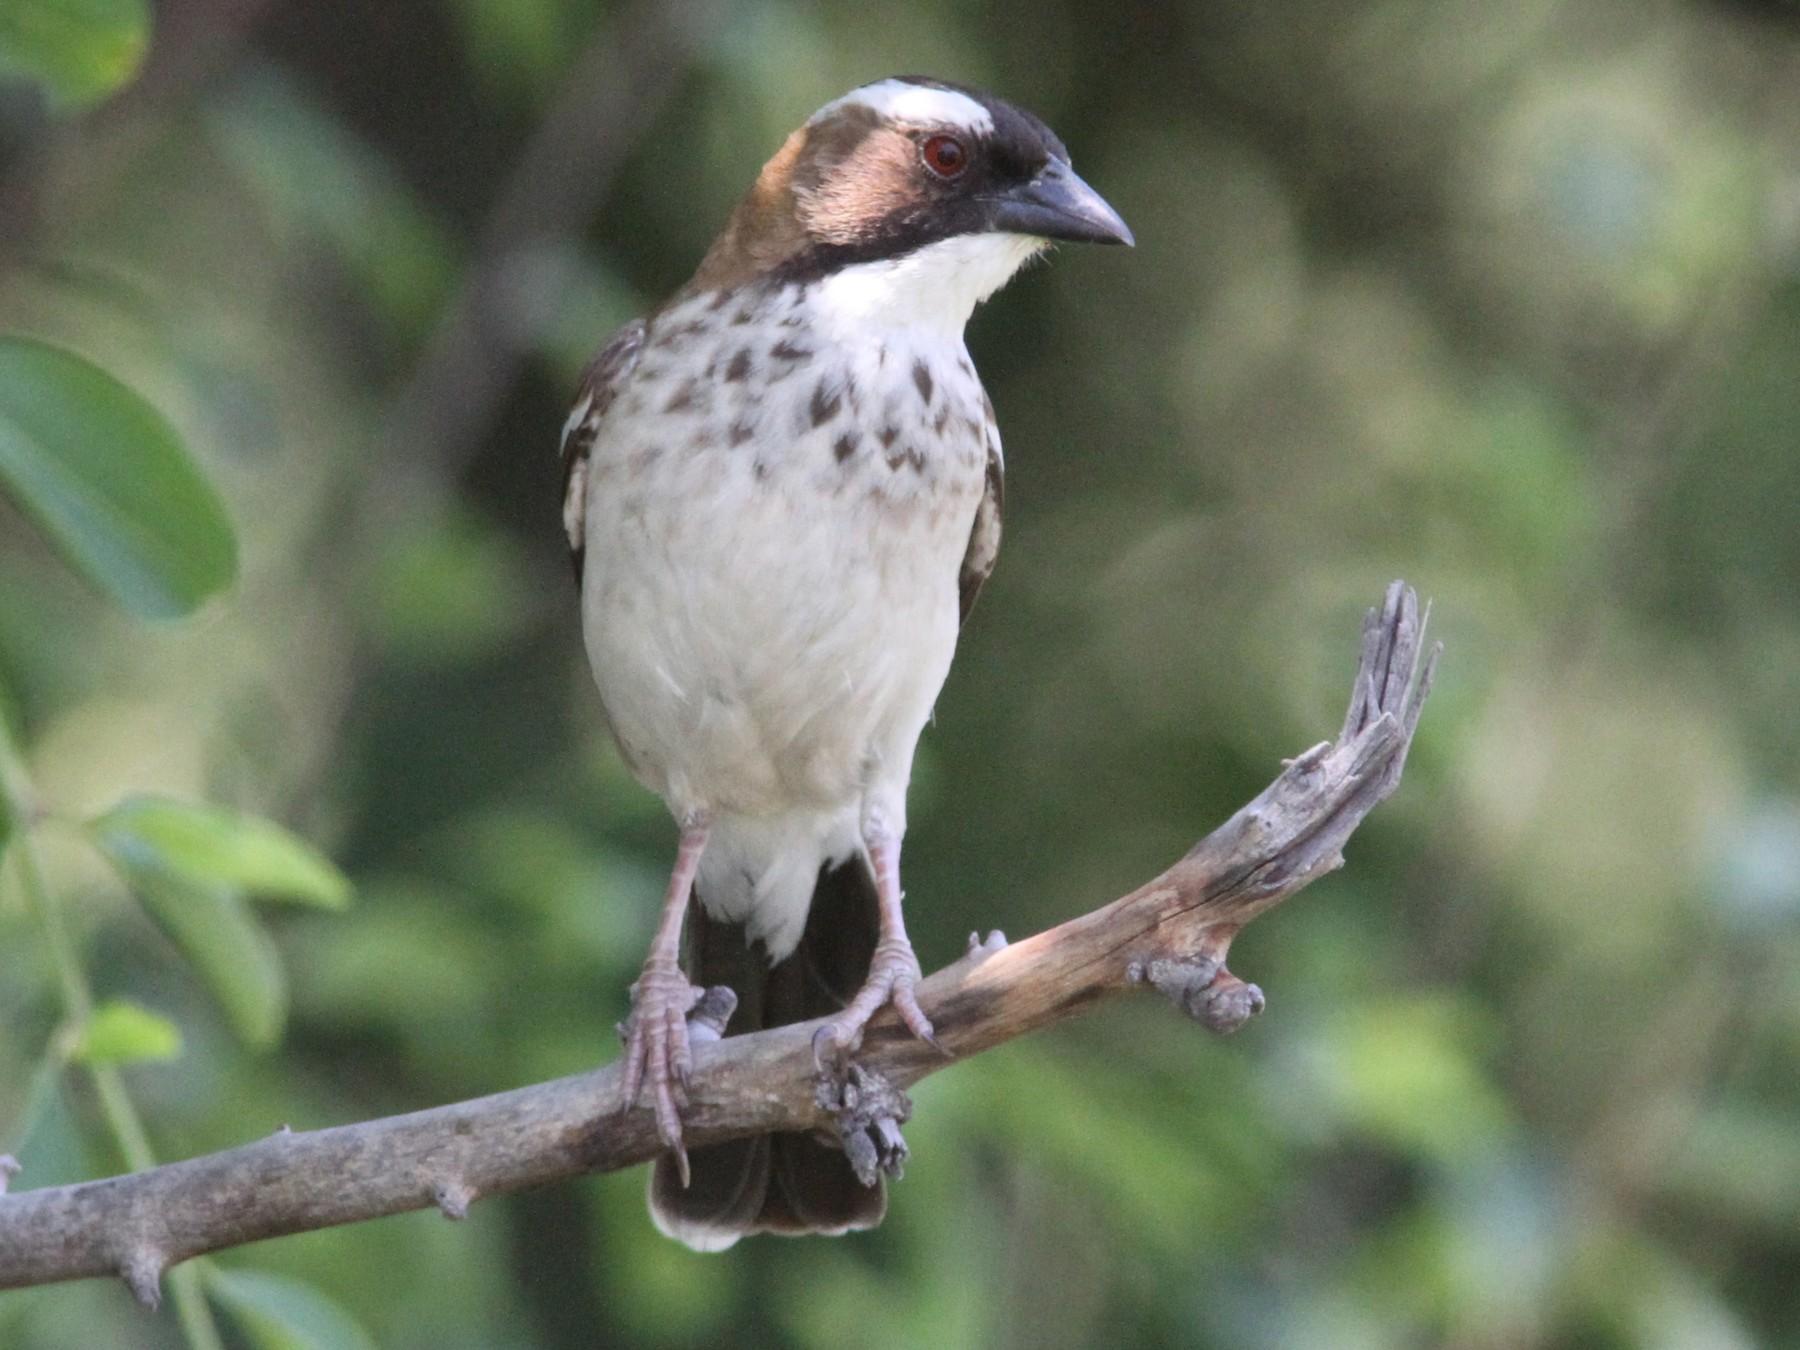 White-browed Sparrow-Weaver - Daniel Jauvin